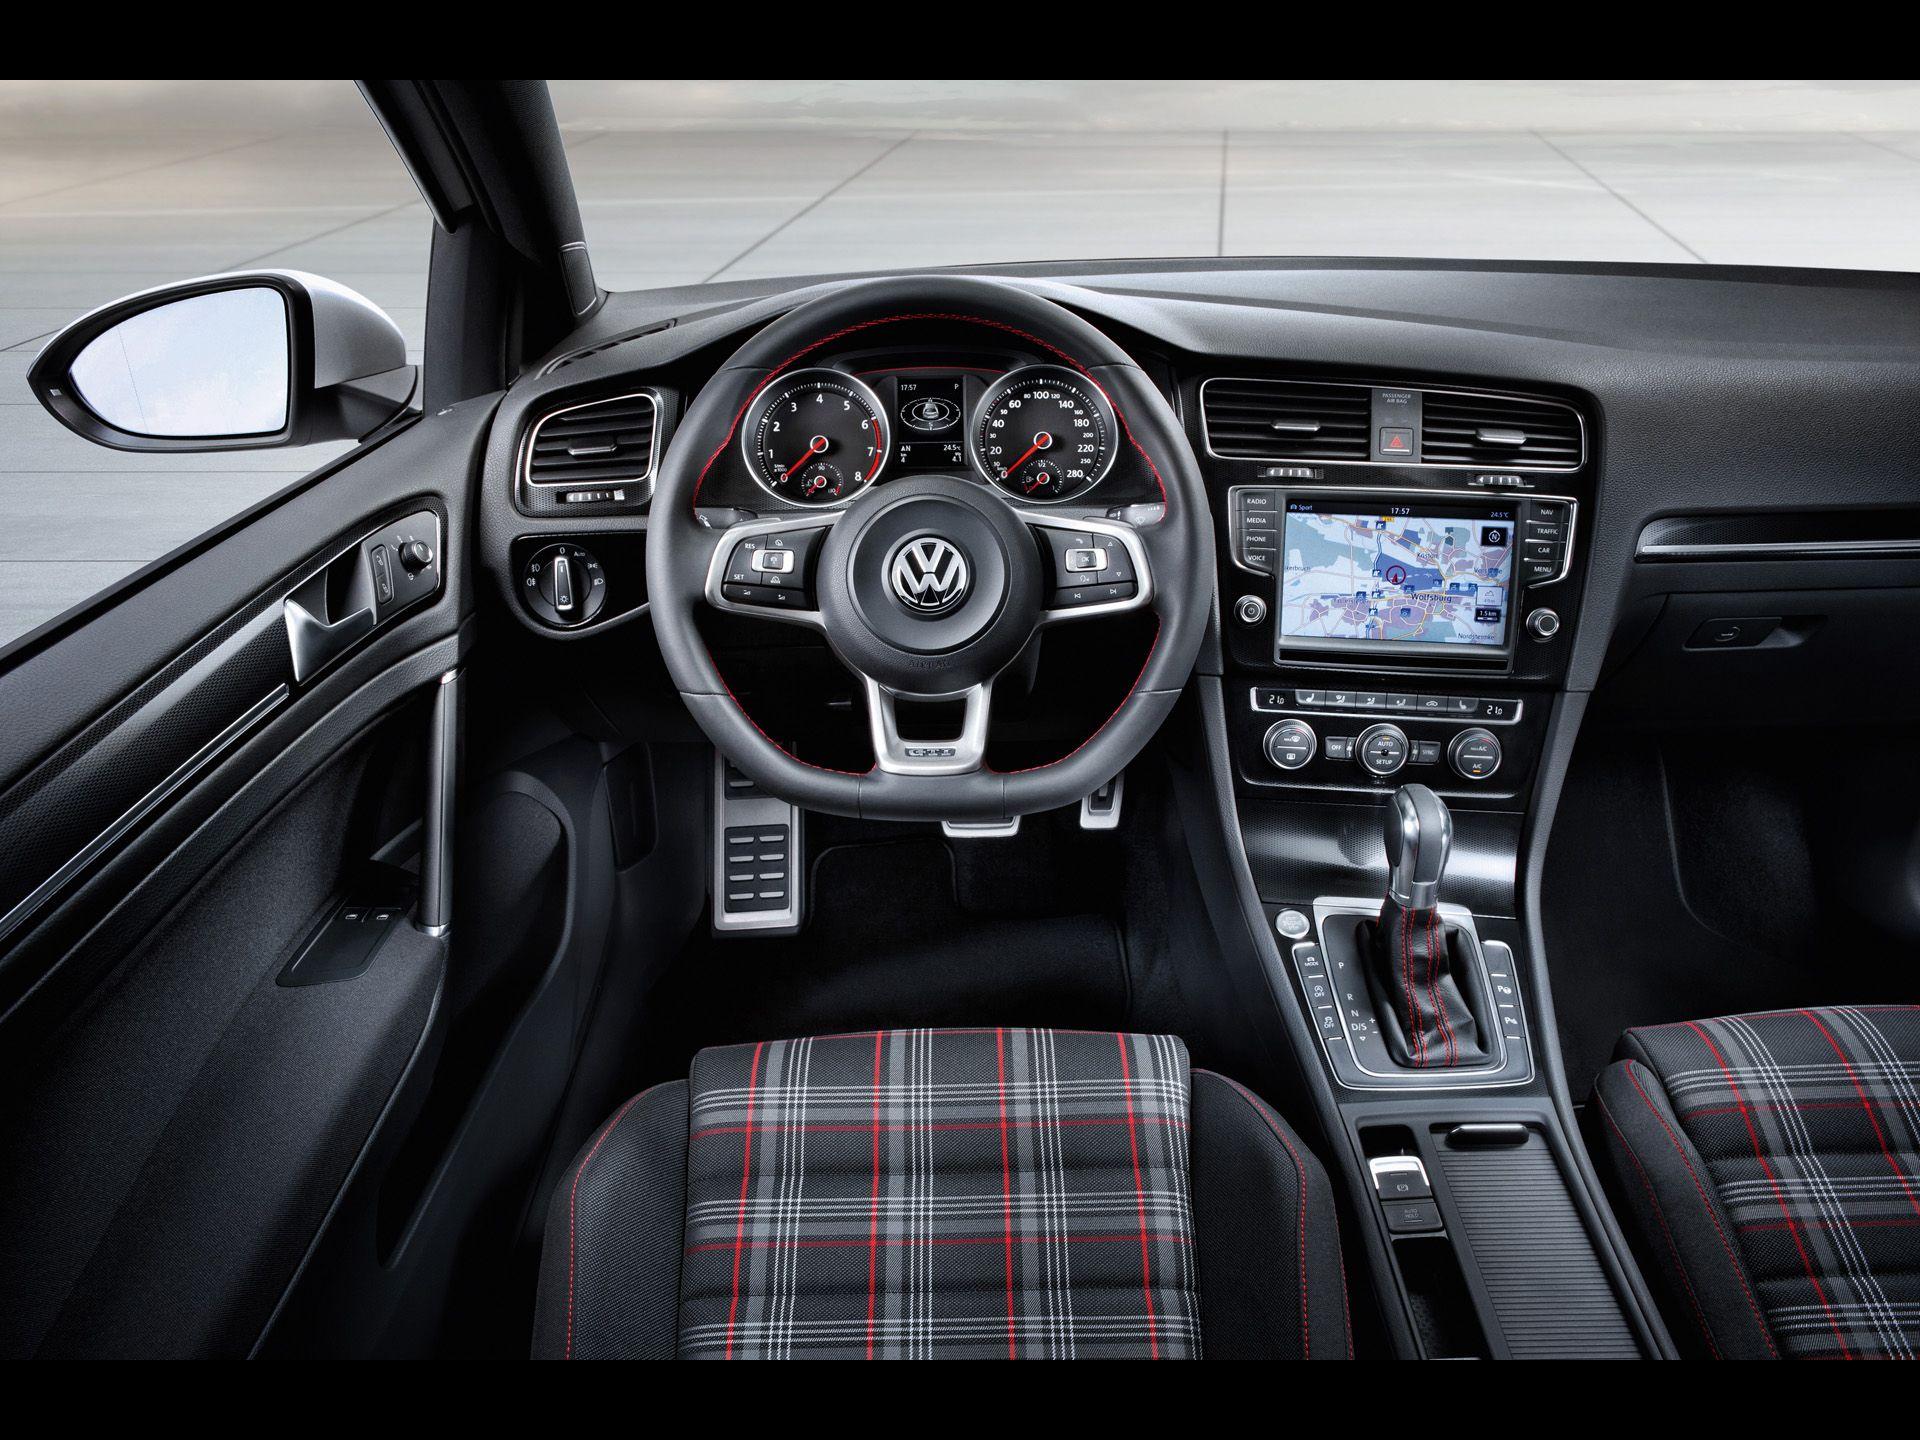 2012 Volkswagen Golf GTI Concept Interior